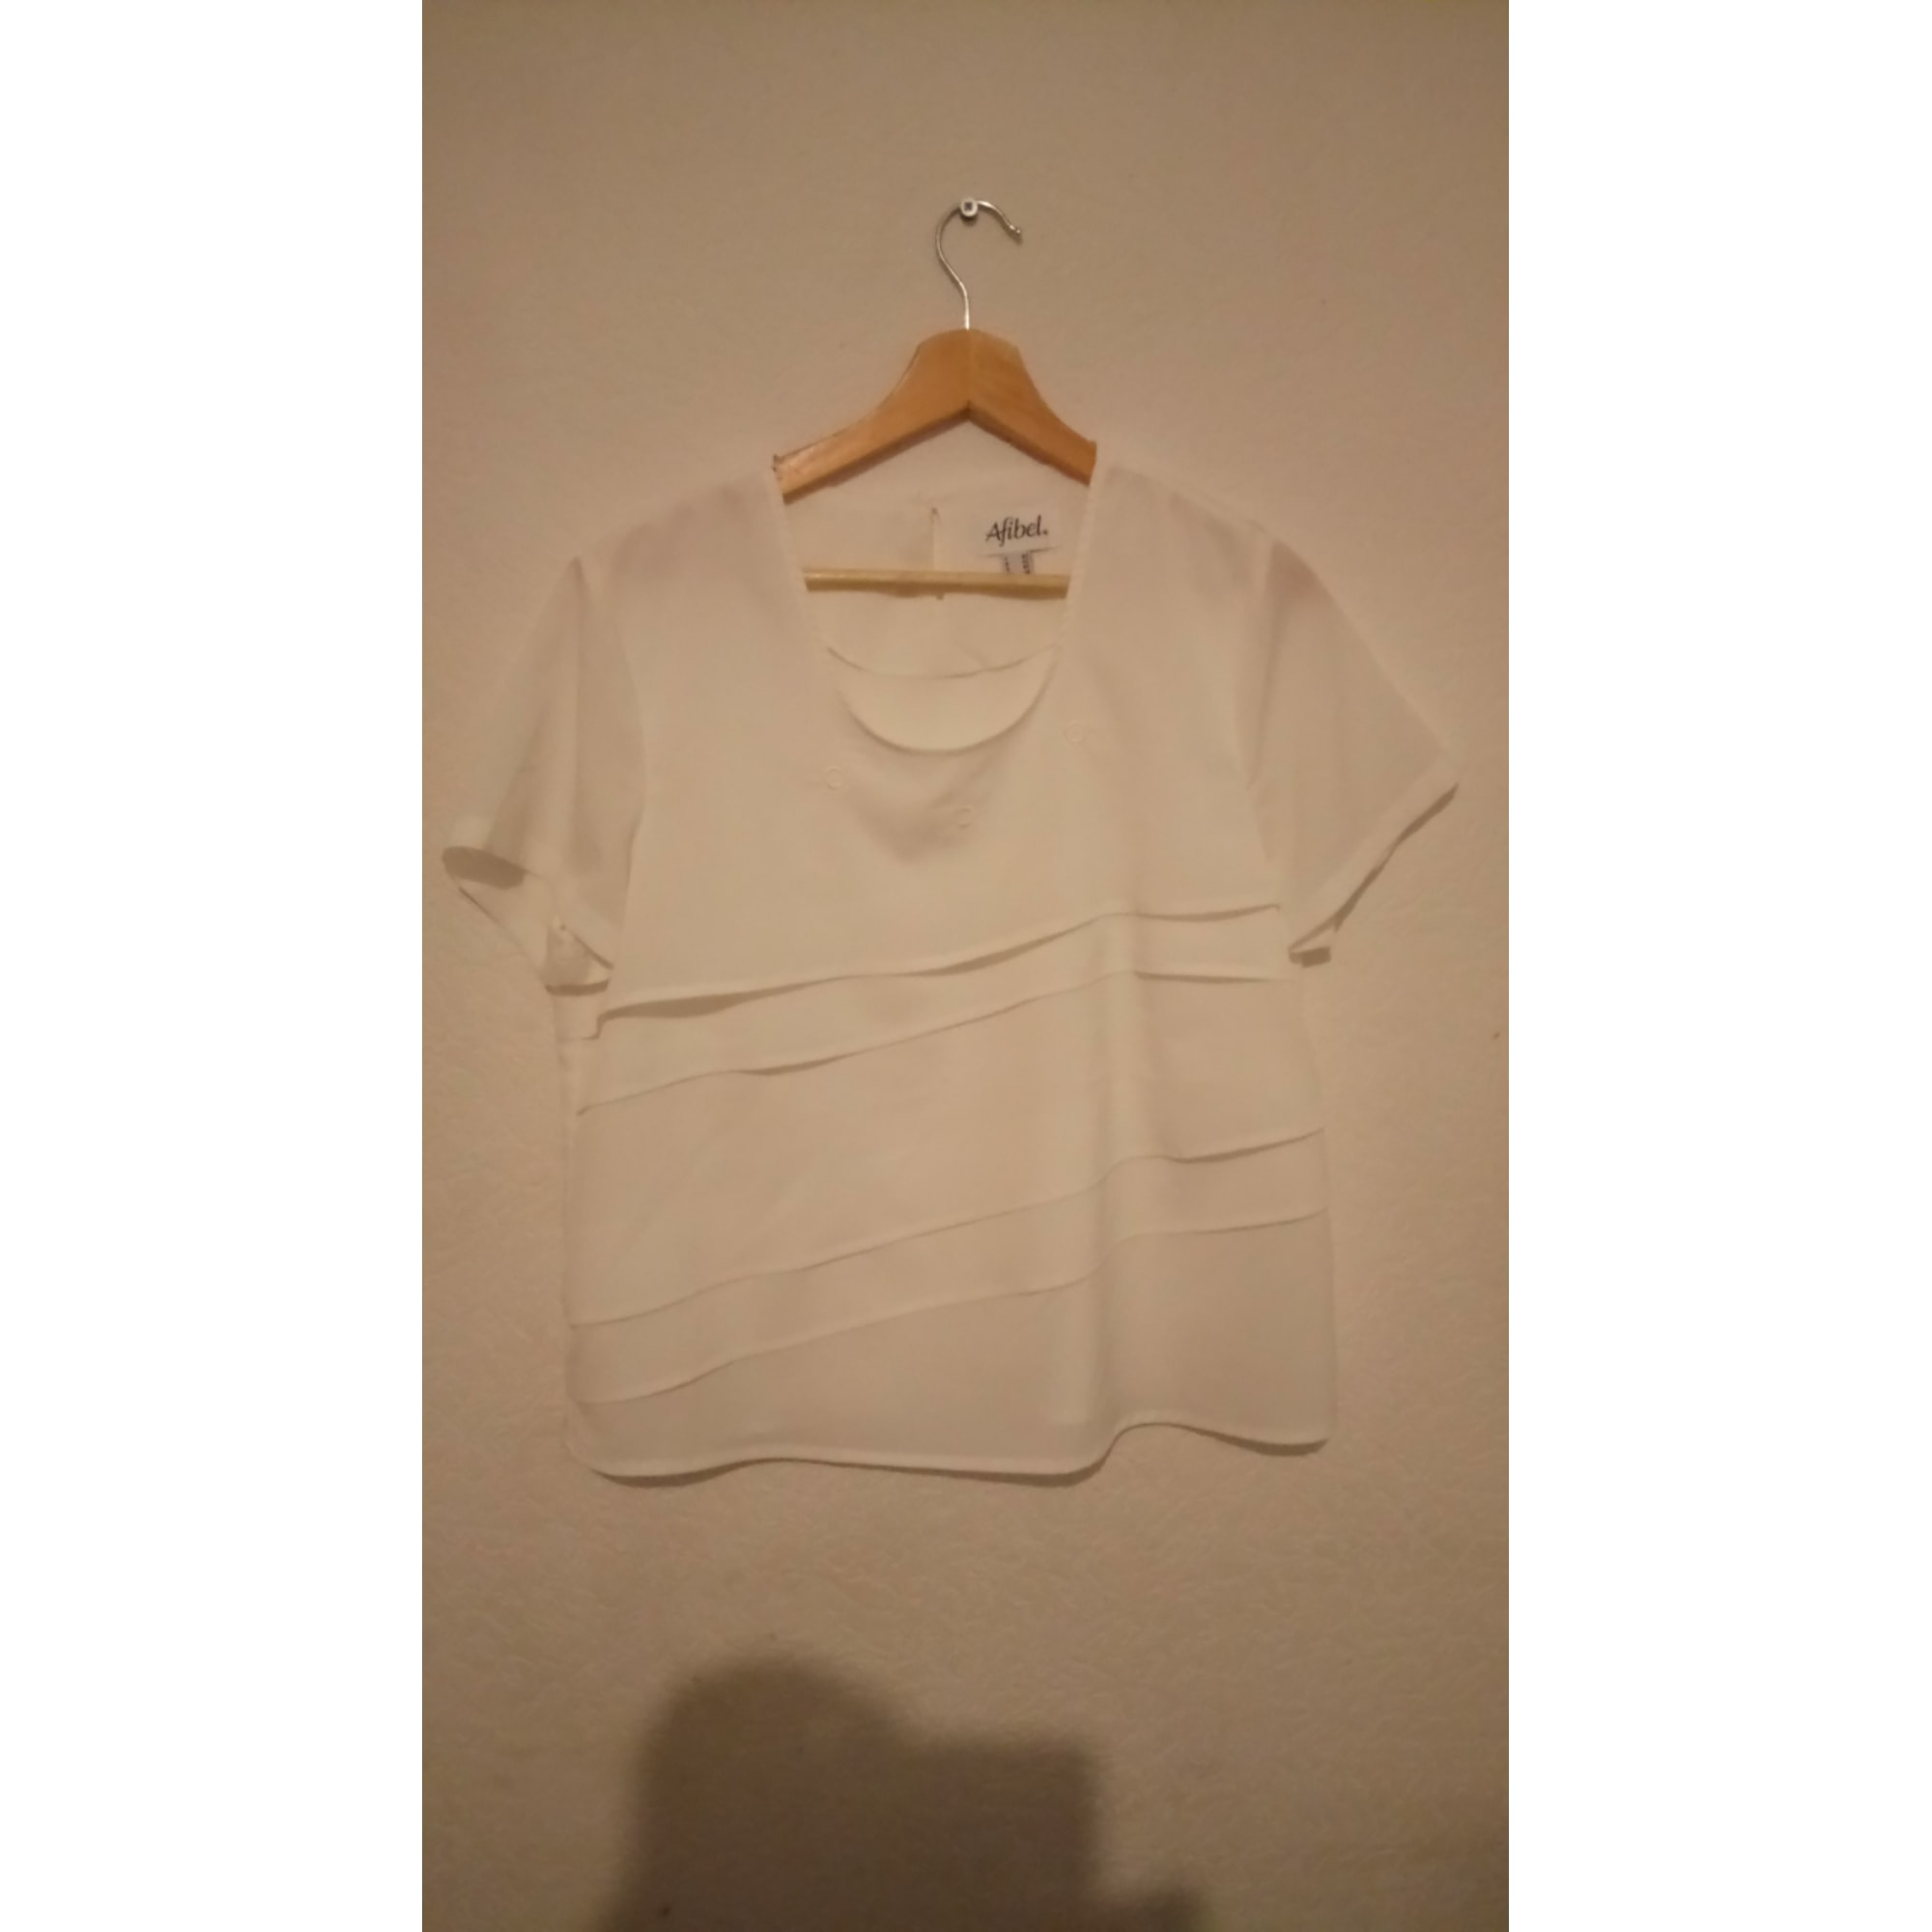 Top, tee-shirt AFIBEL Blanc, blanc cassé, écru